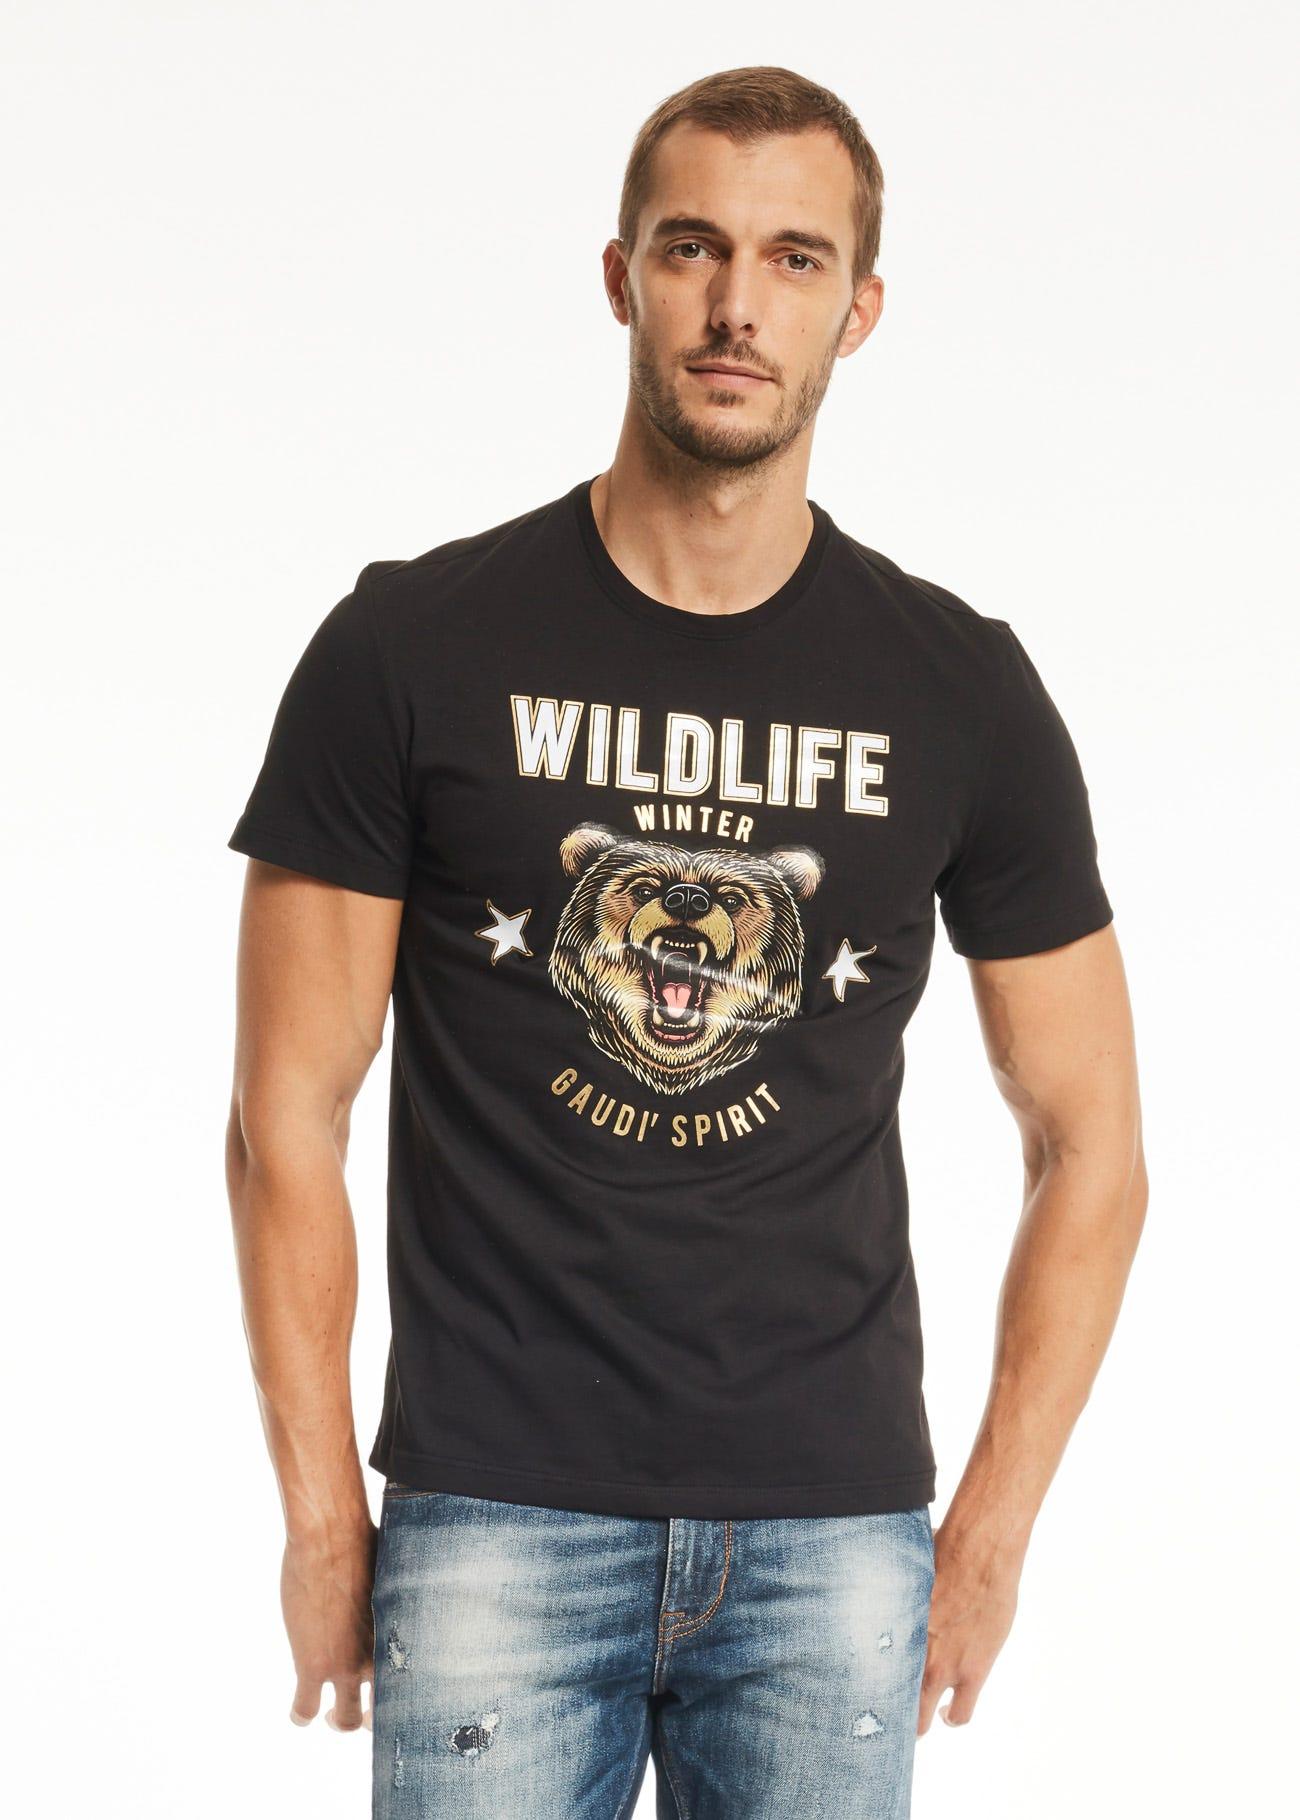 T shirt Wildlife